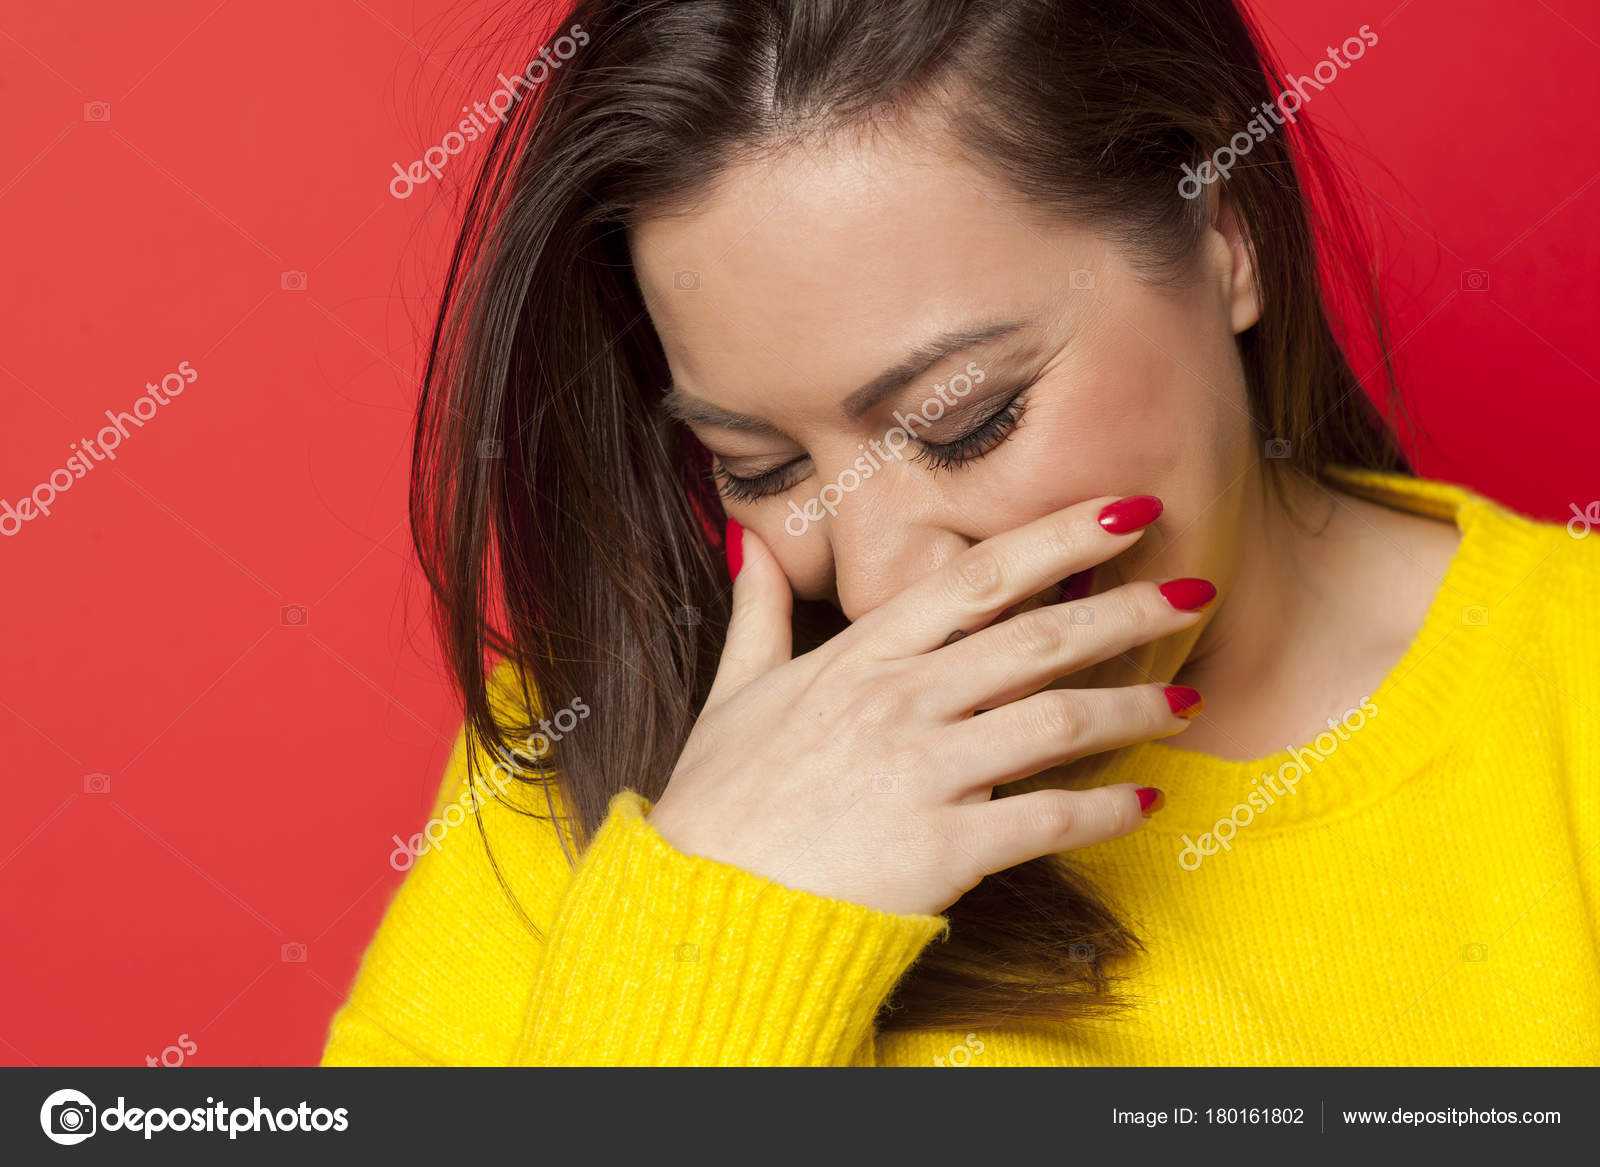 cf115392cc1c Όμορφη Γυναίκα Ντροπή Κίτρινο Πουλόβερ Κόκκινο Φόντο — Φωτογραφία Αρχείου